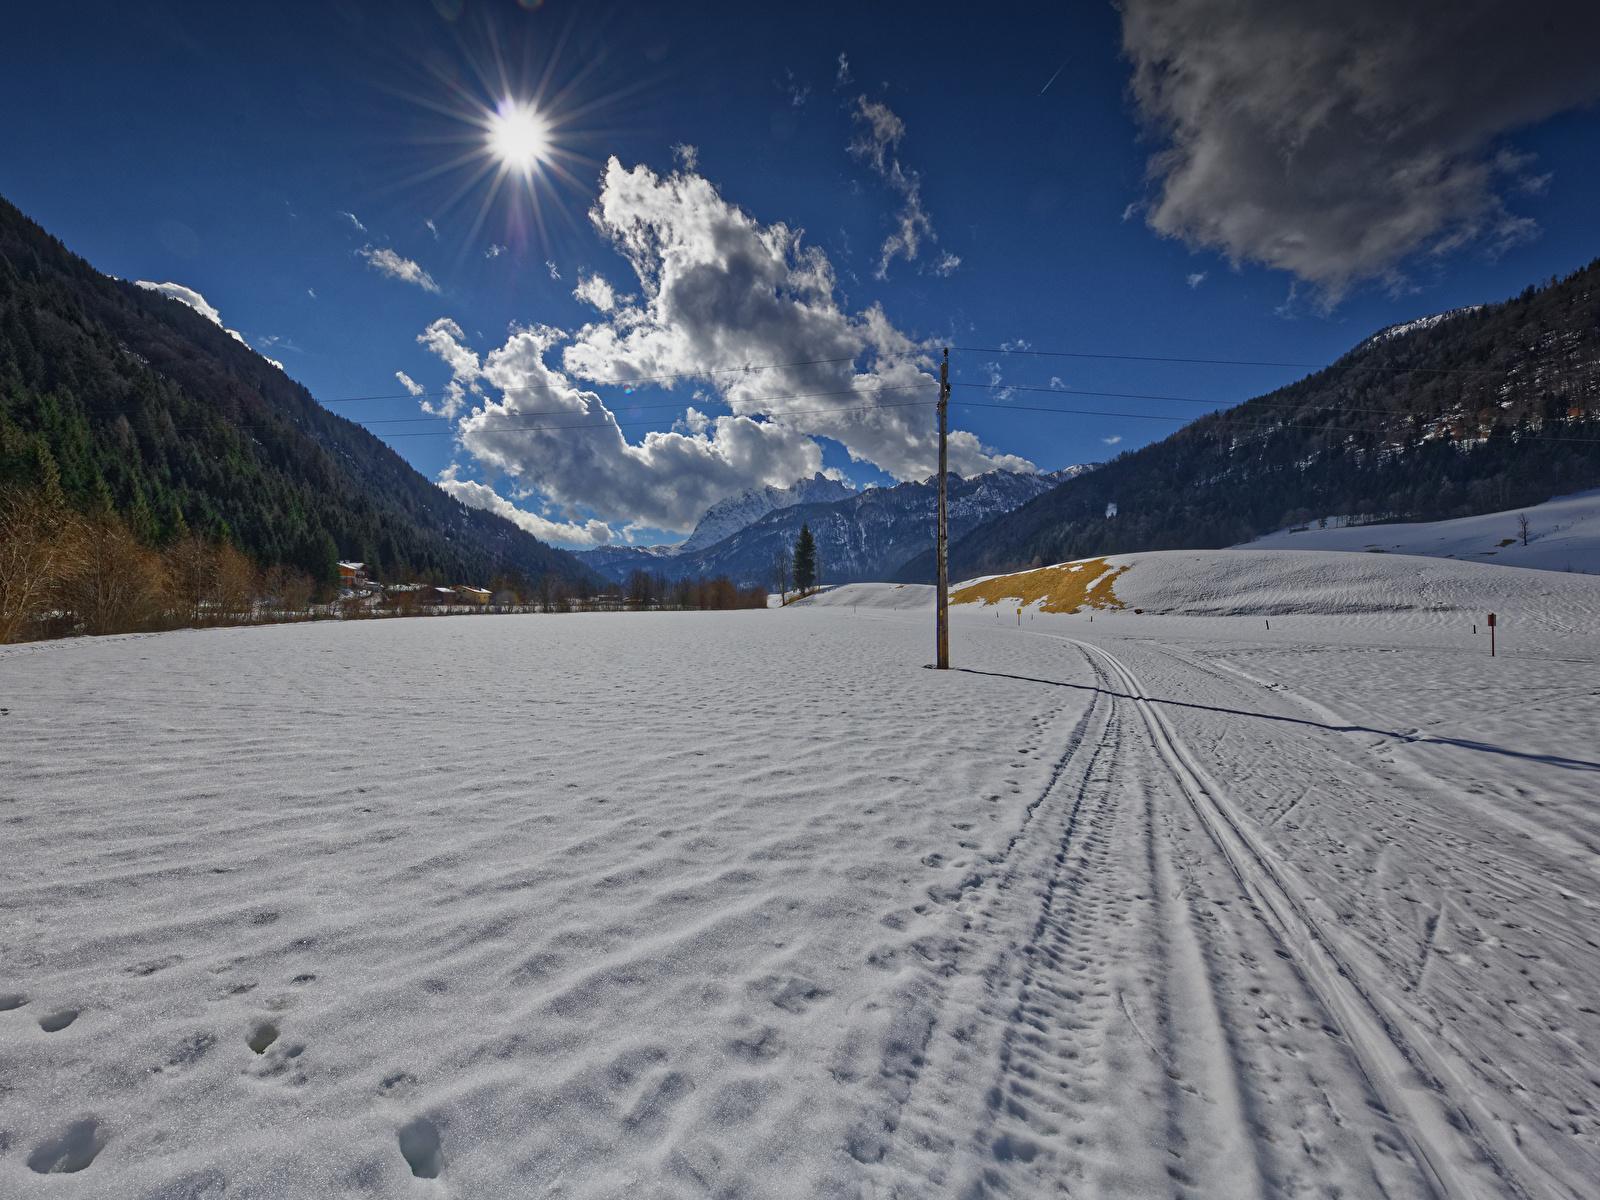 Картинка Австрия Tyrol гора зимние Солнце Природа снегу облачно 1600x1200 Зима Горы солнца Снег снеге снега облако Облака